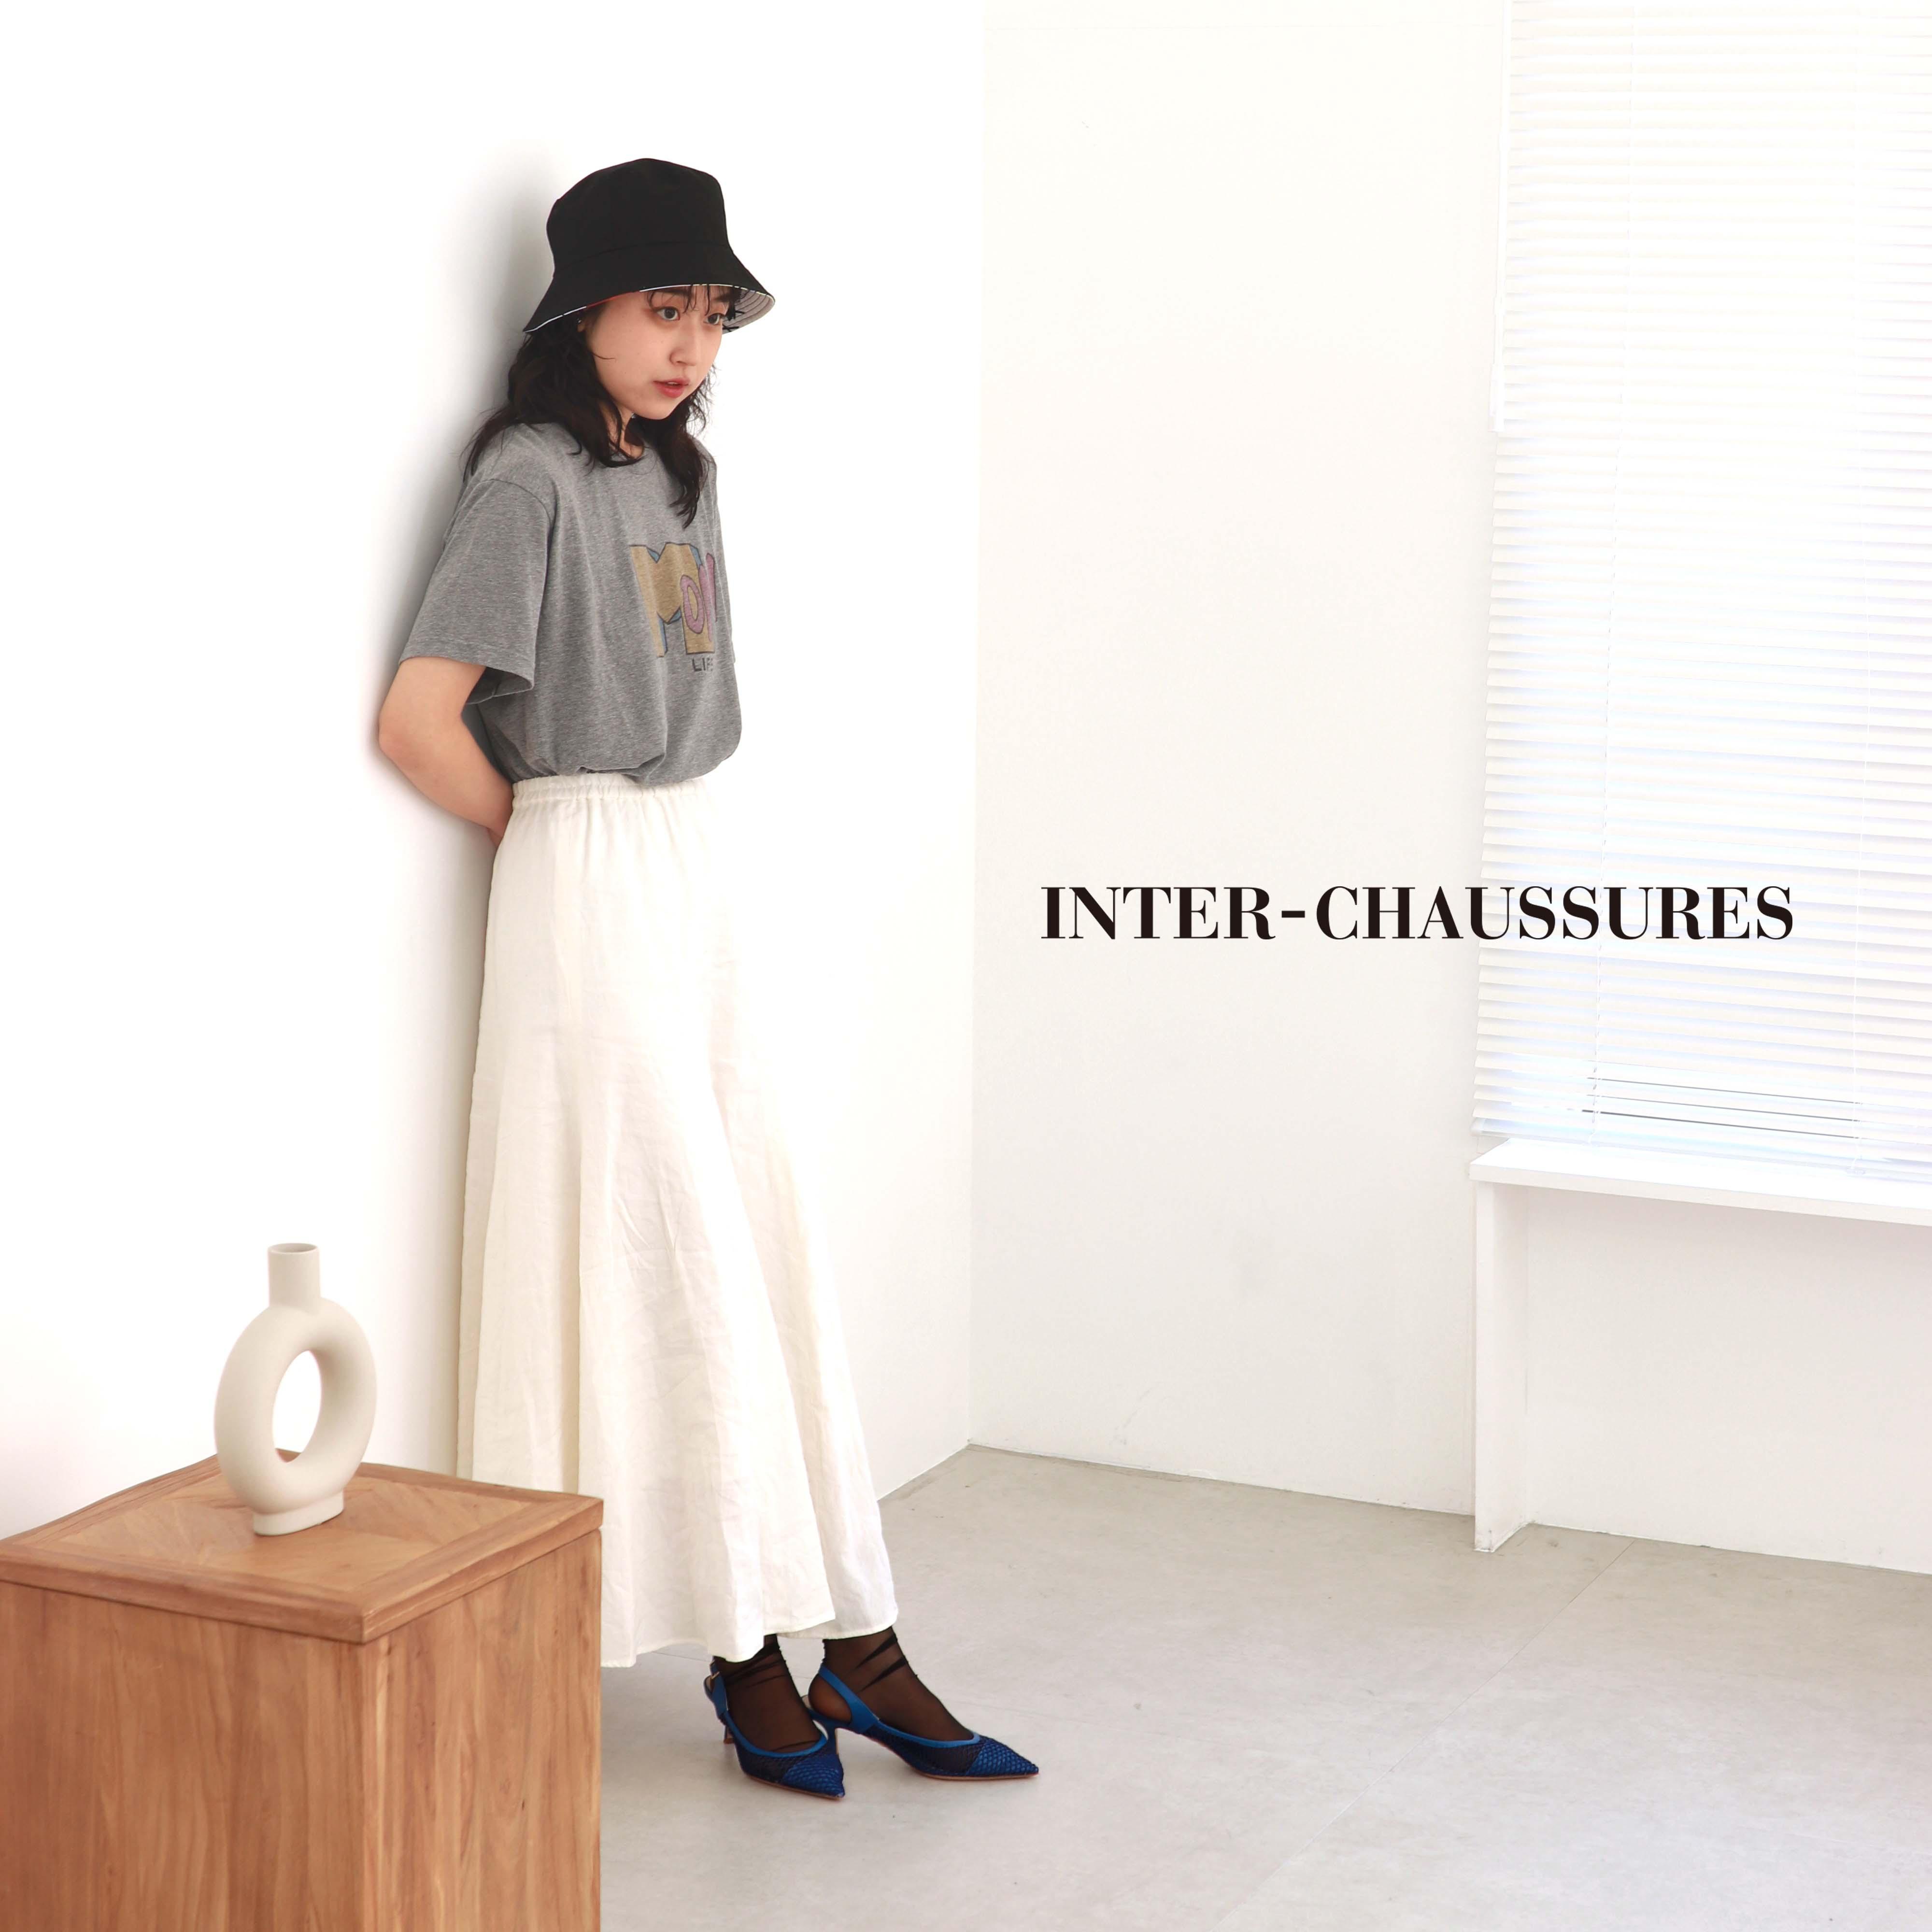 INTER-CHAUSSURES